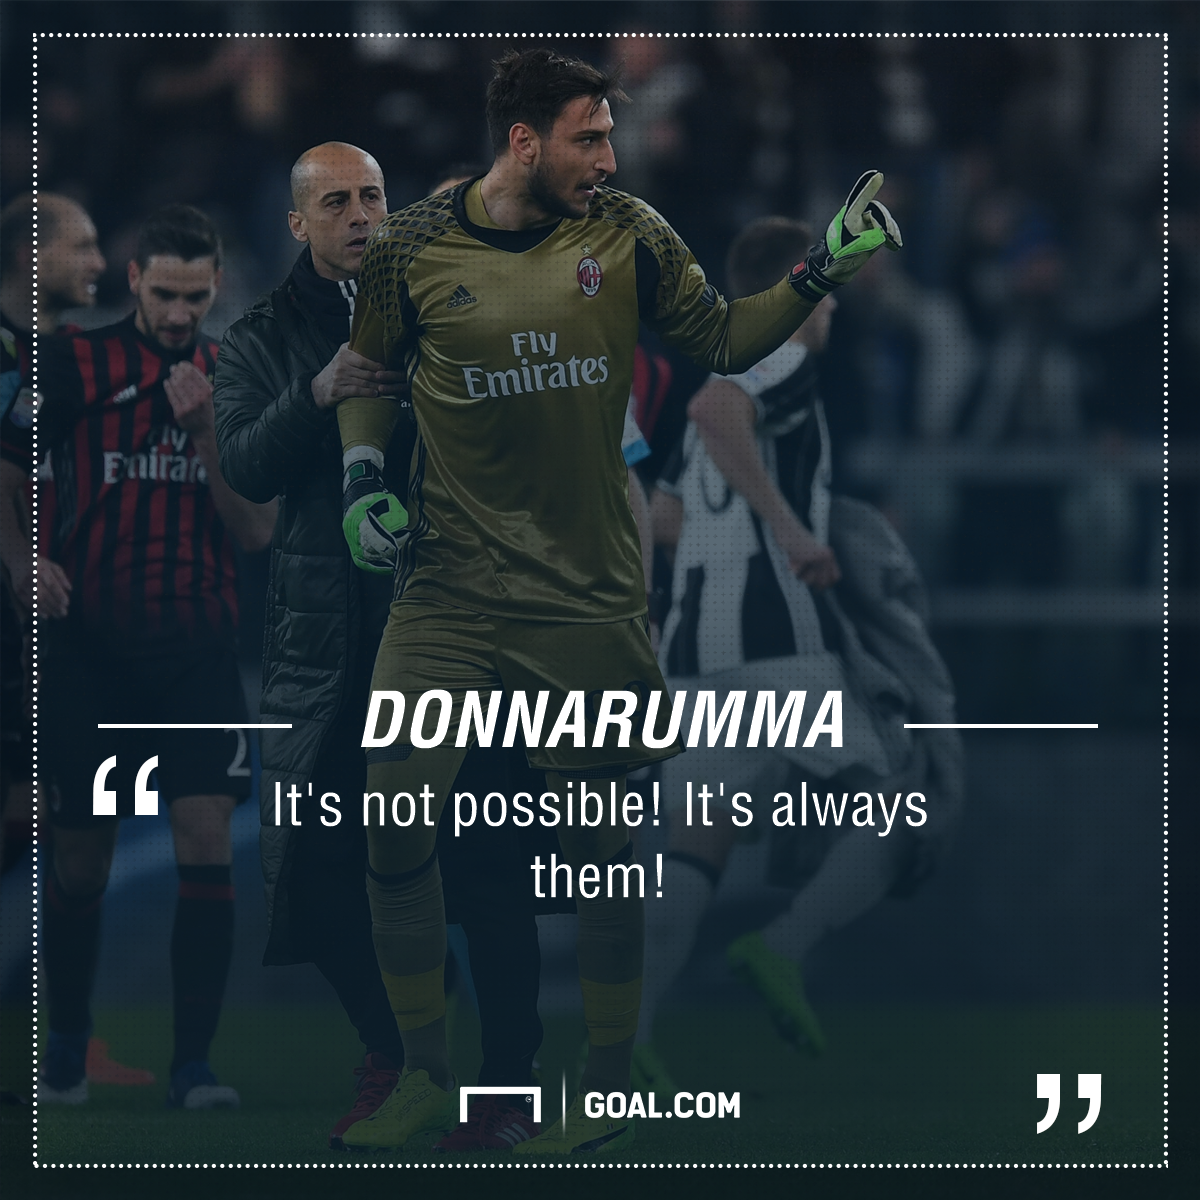 Gigio Donnarumma AC Milan Juventus PS